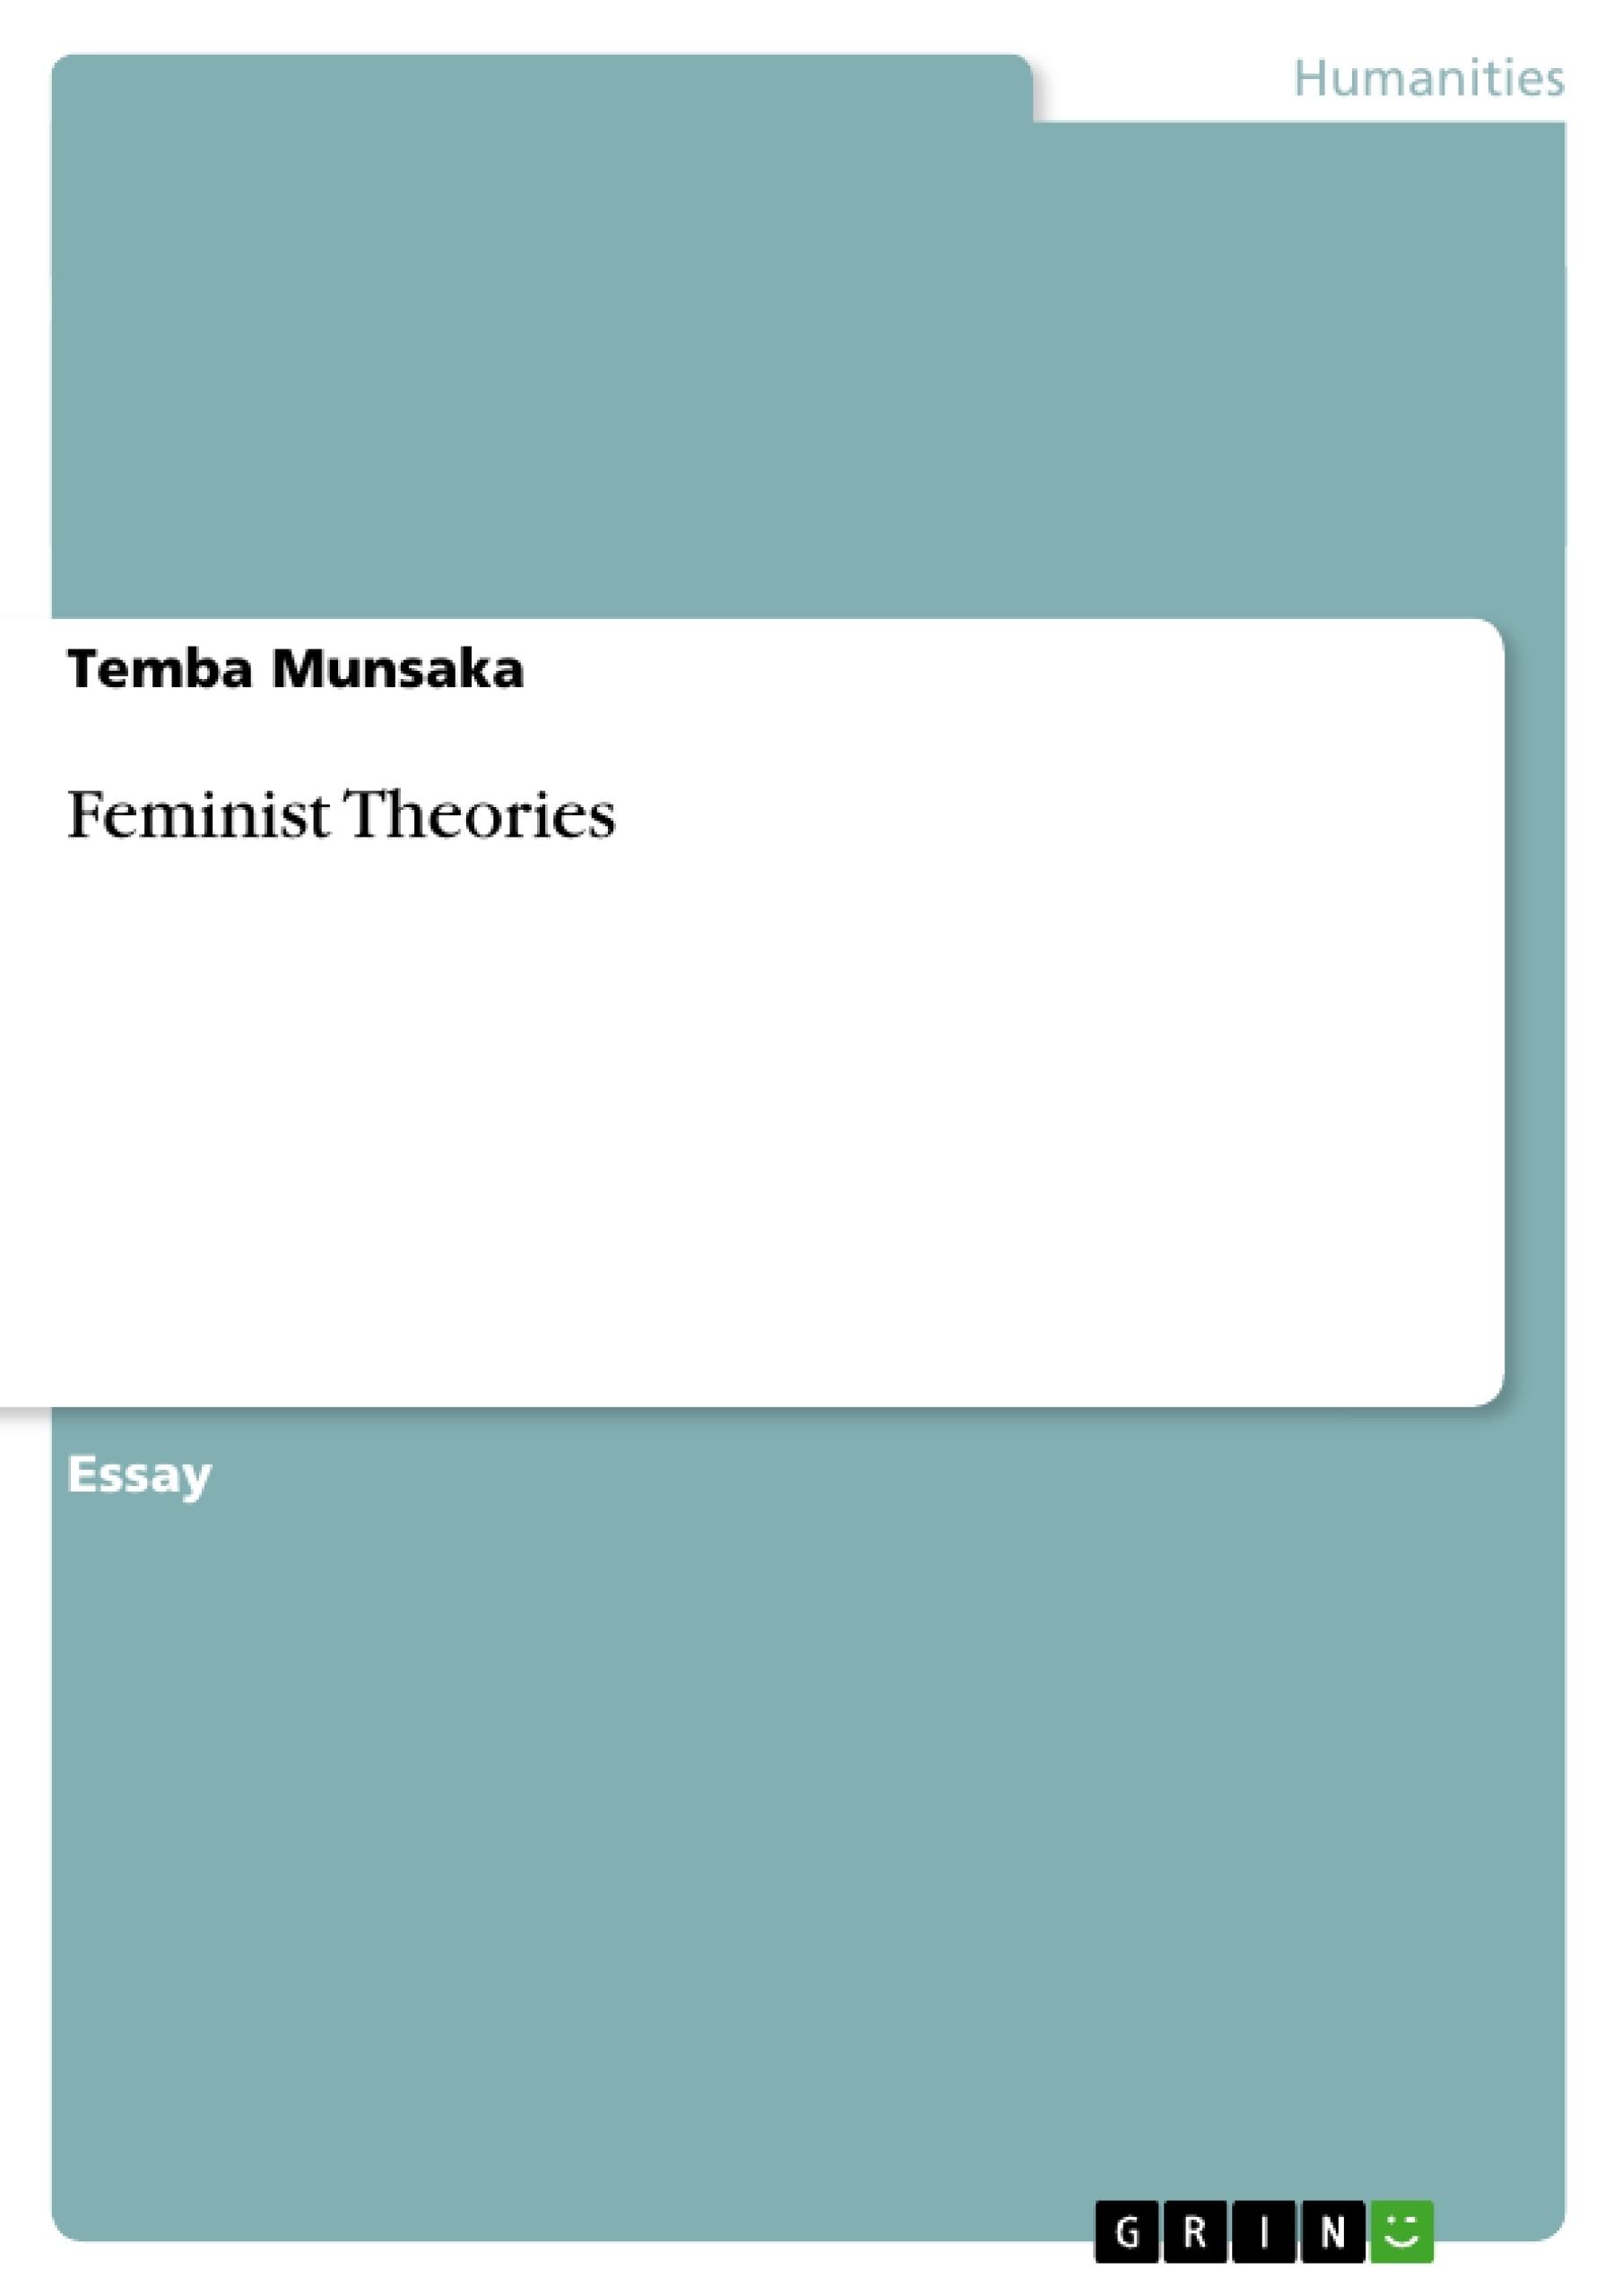 Title: Feminist Theories